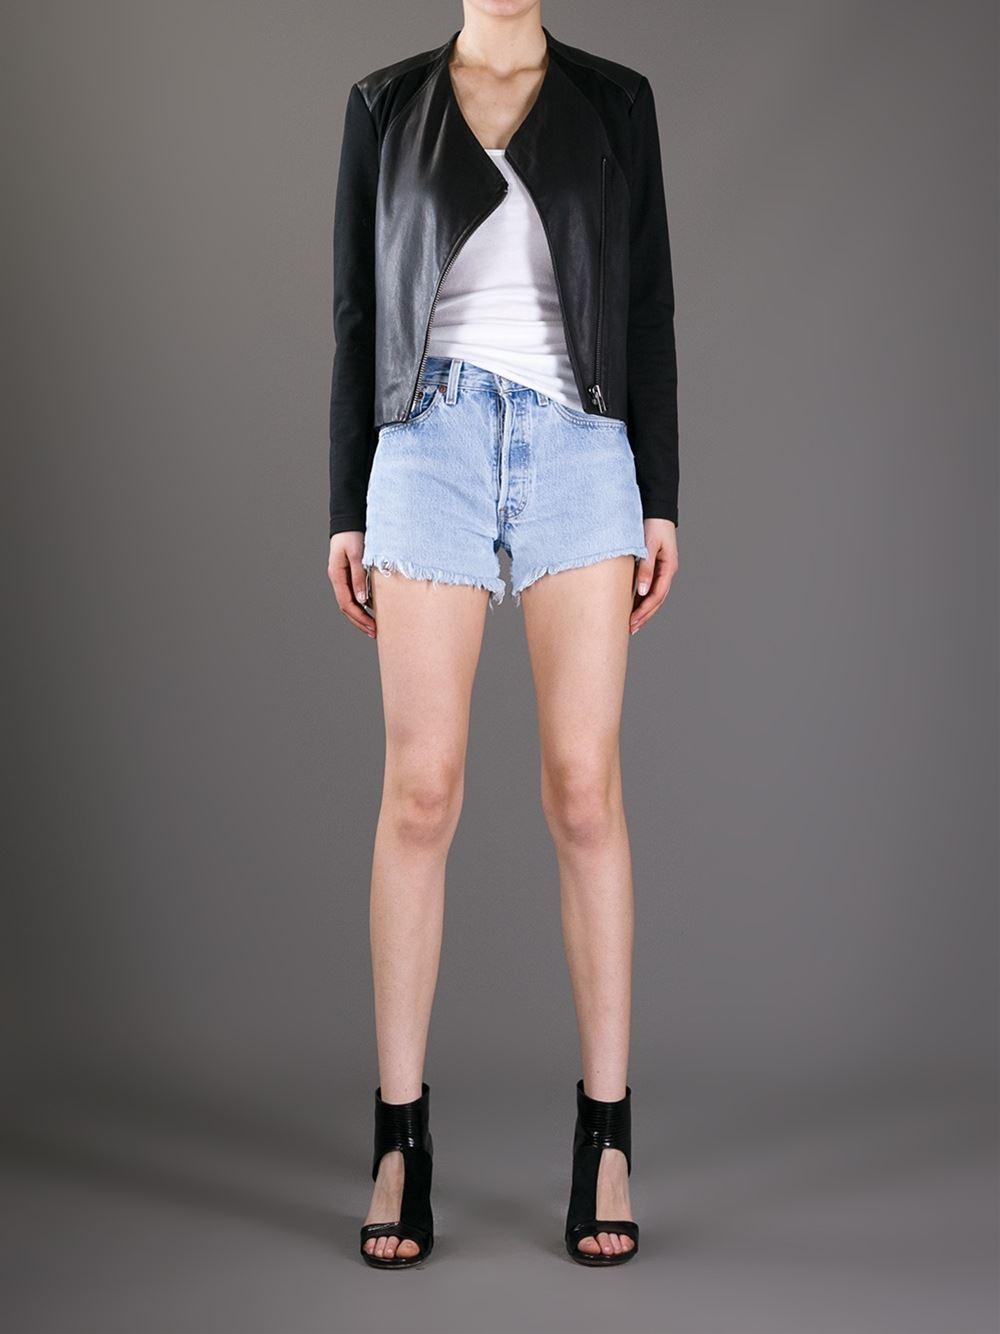 Levis A.n.g.e.l.o. Recycled Vintage Frayed Shorts - A.n.g.e.l.o Vintage - Farfetch.com